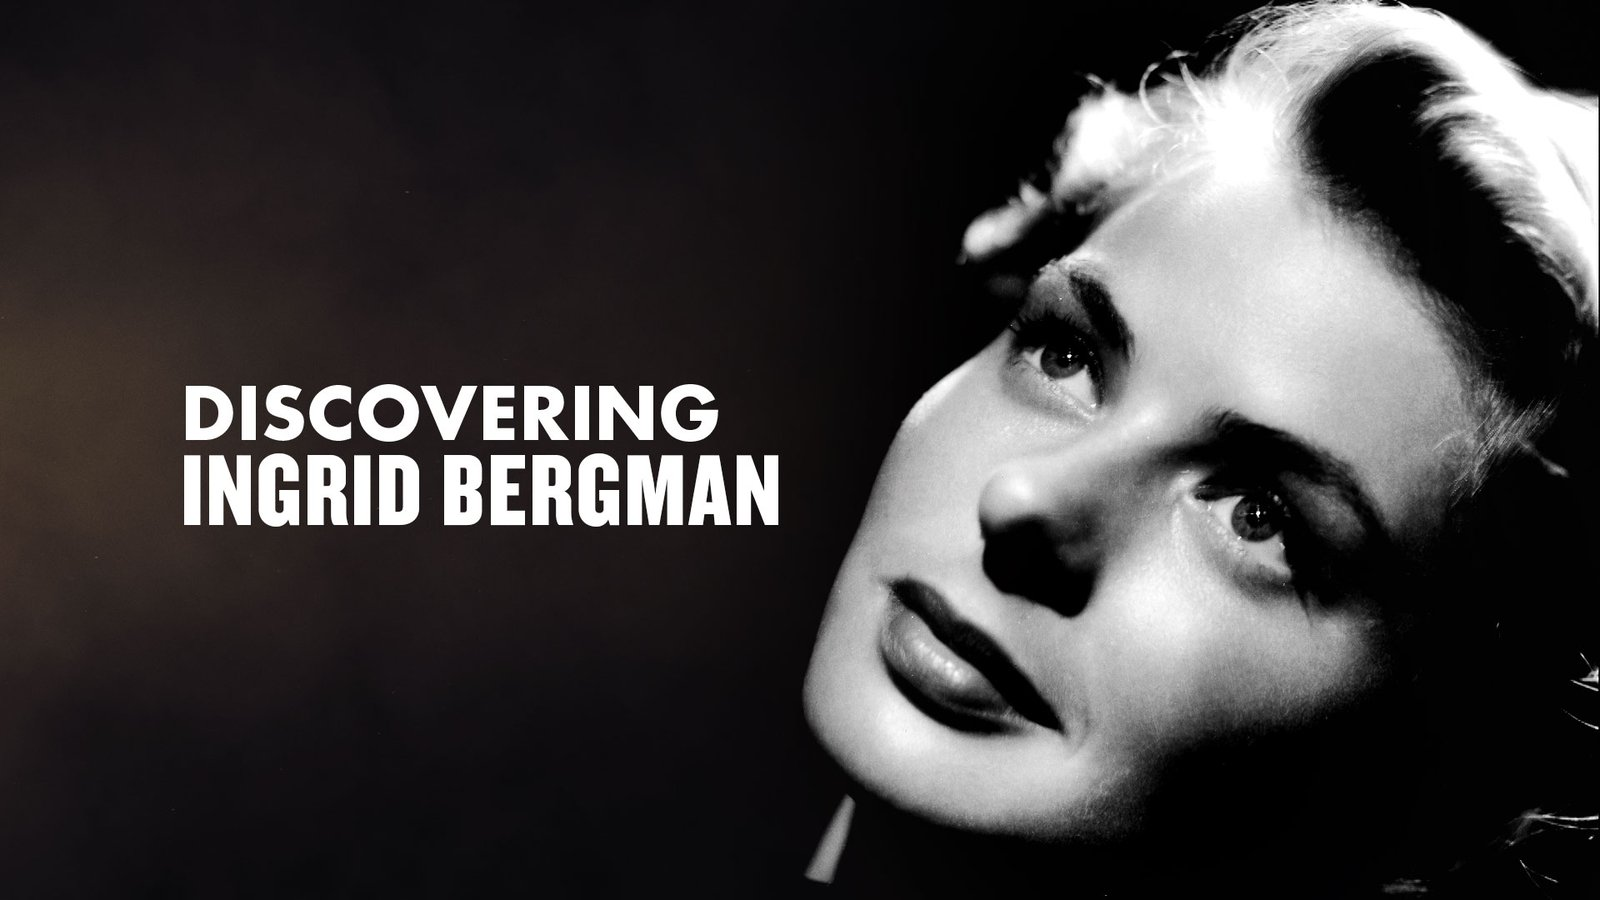 Discovering Ingrid Bergman